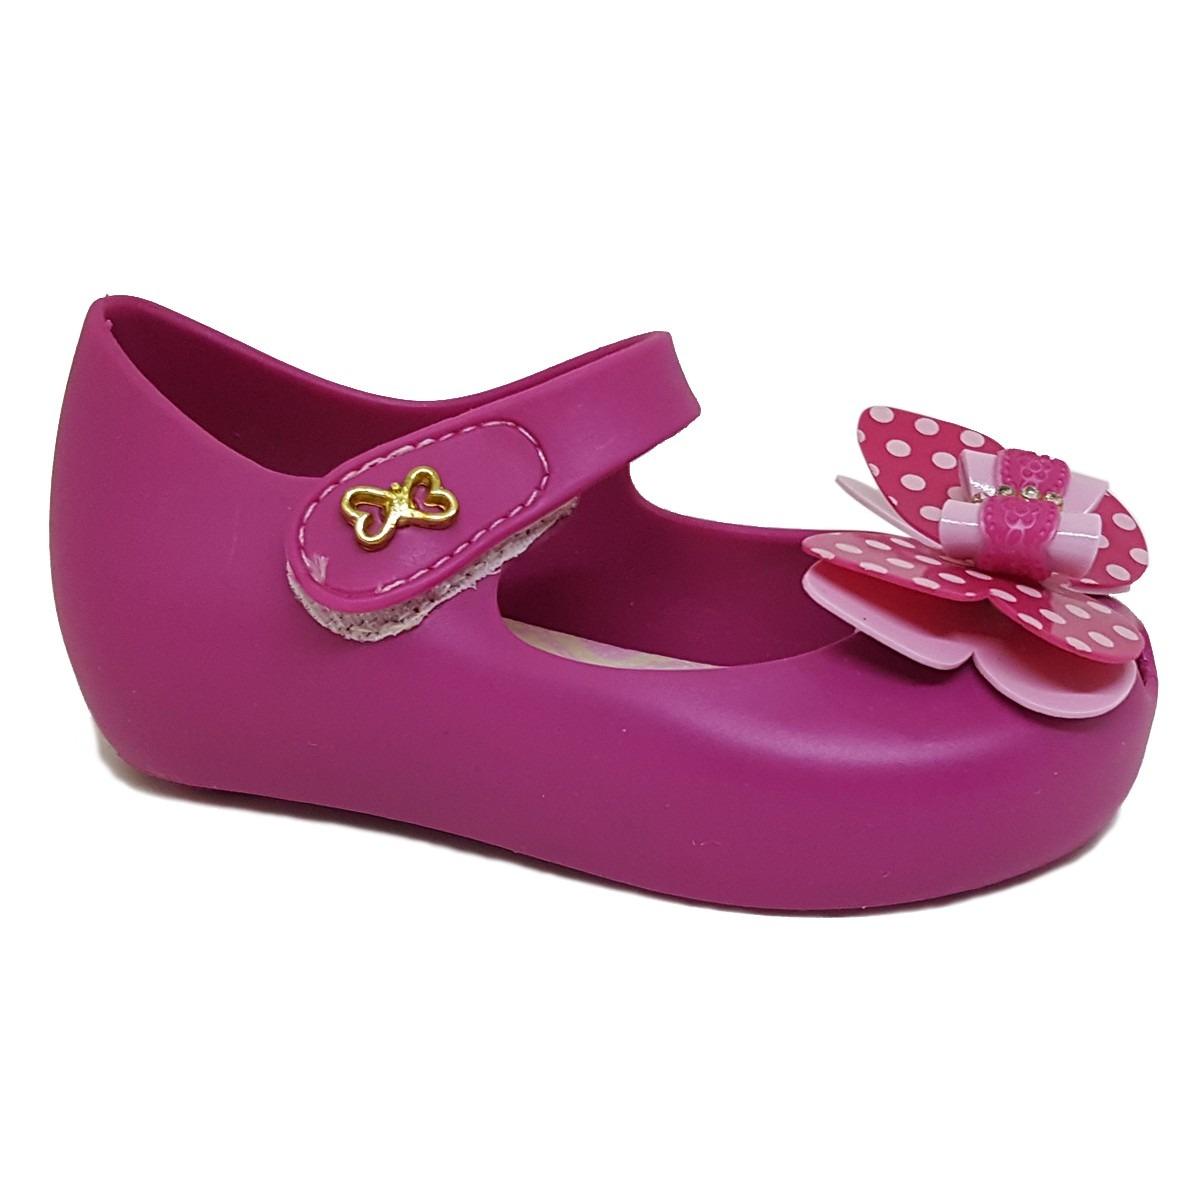 6933269bb5 Sapatilha Infantil World Colors Rosa Pink Para Meninas - R  39